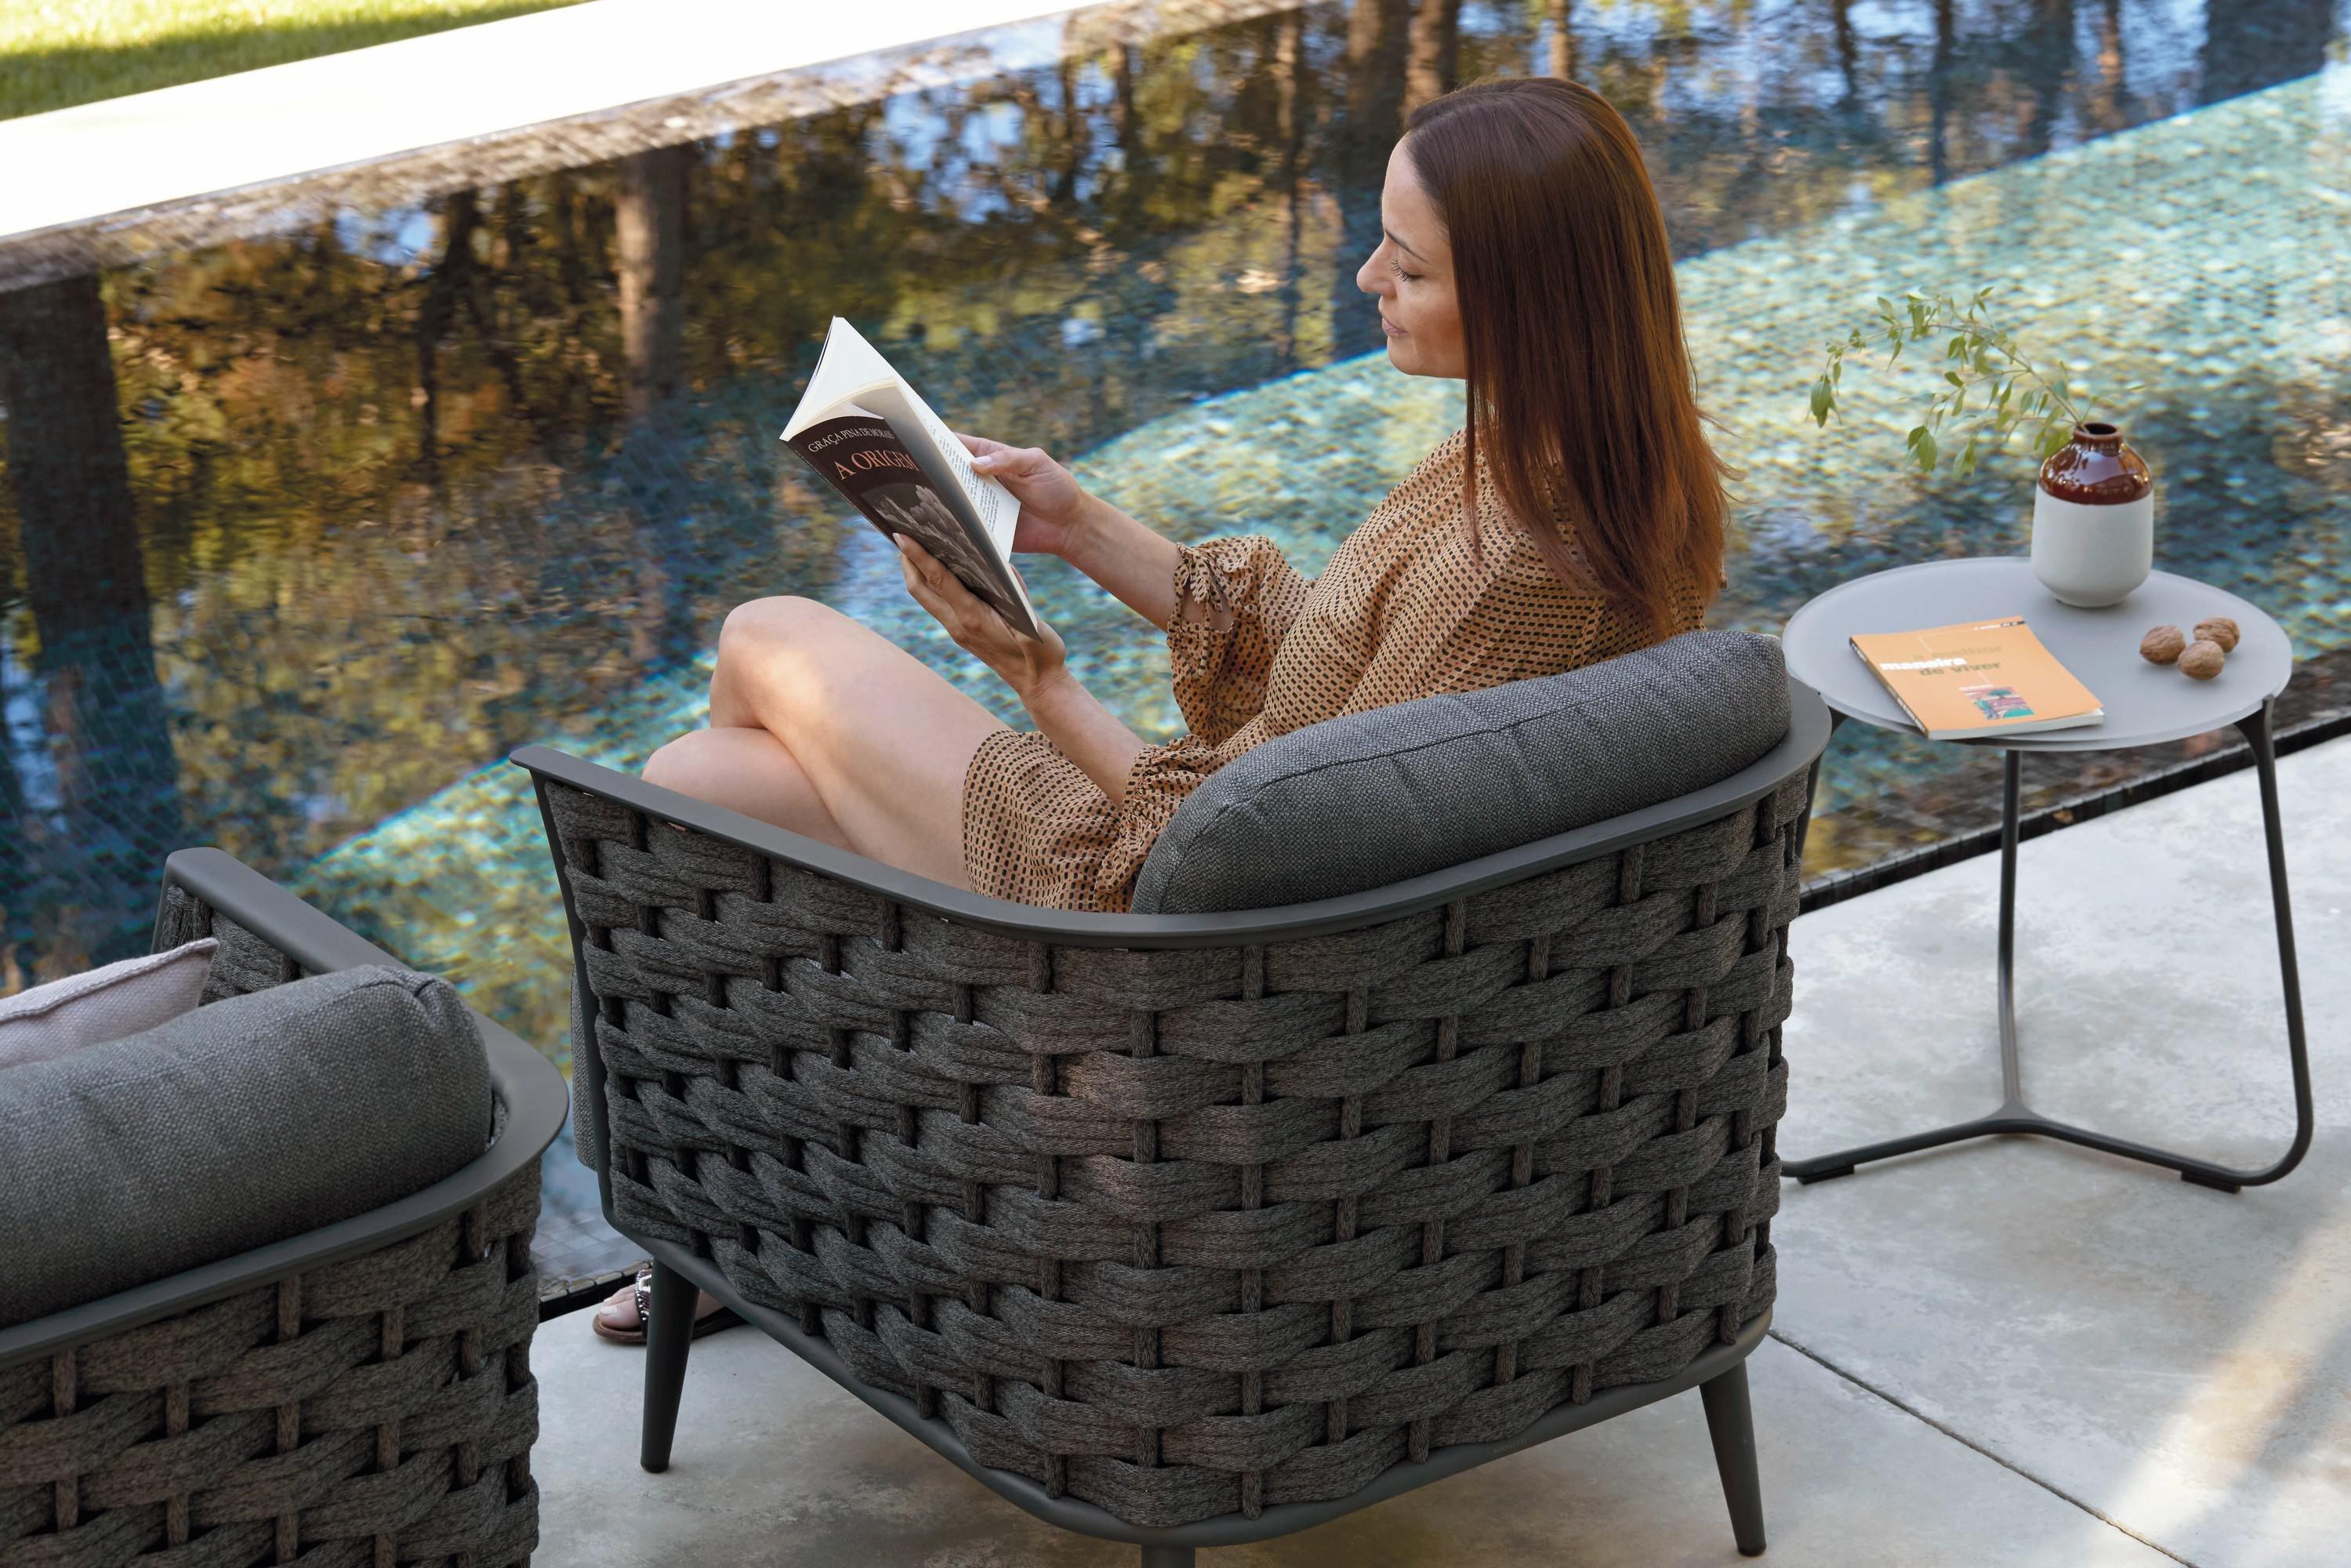 Cascade Chair lounge from Manutti, designed by Stephane De Winter